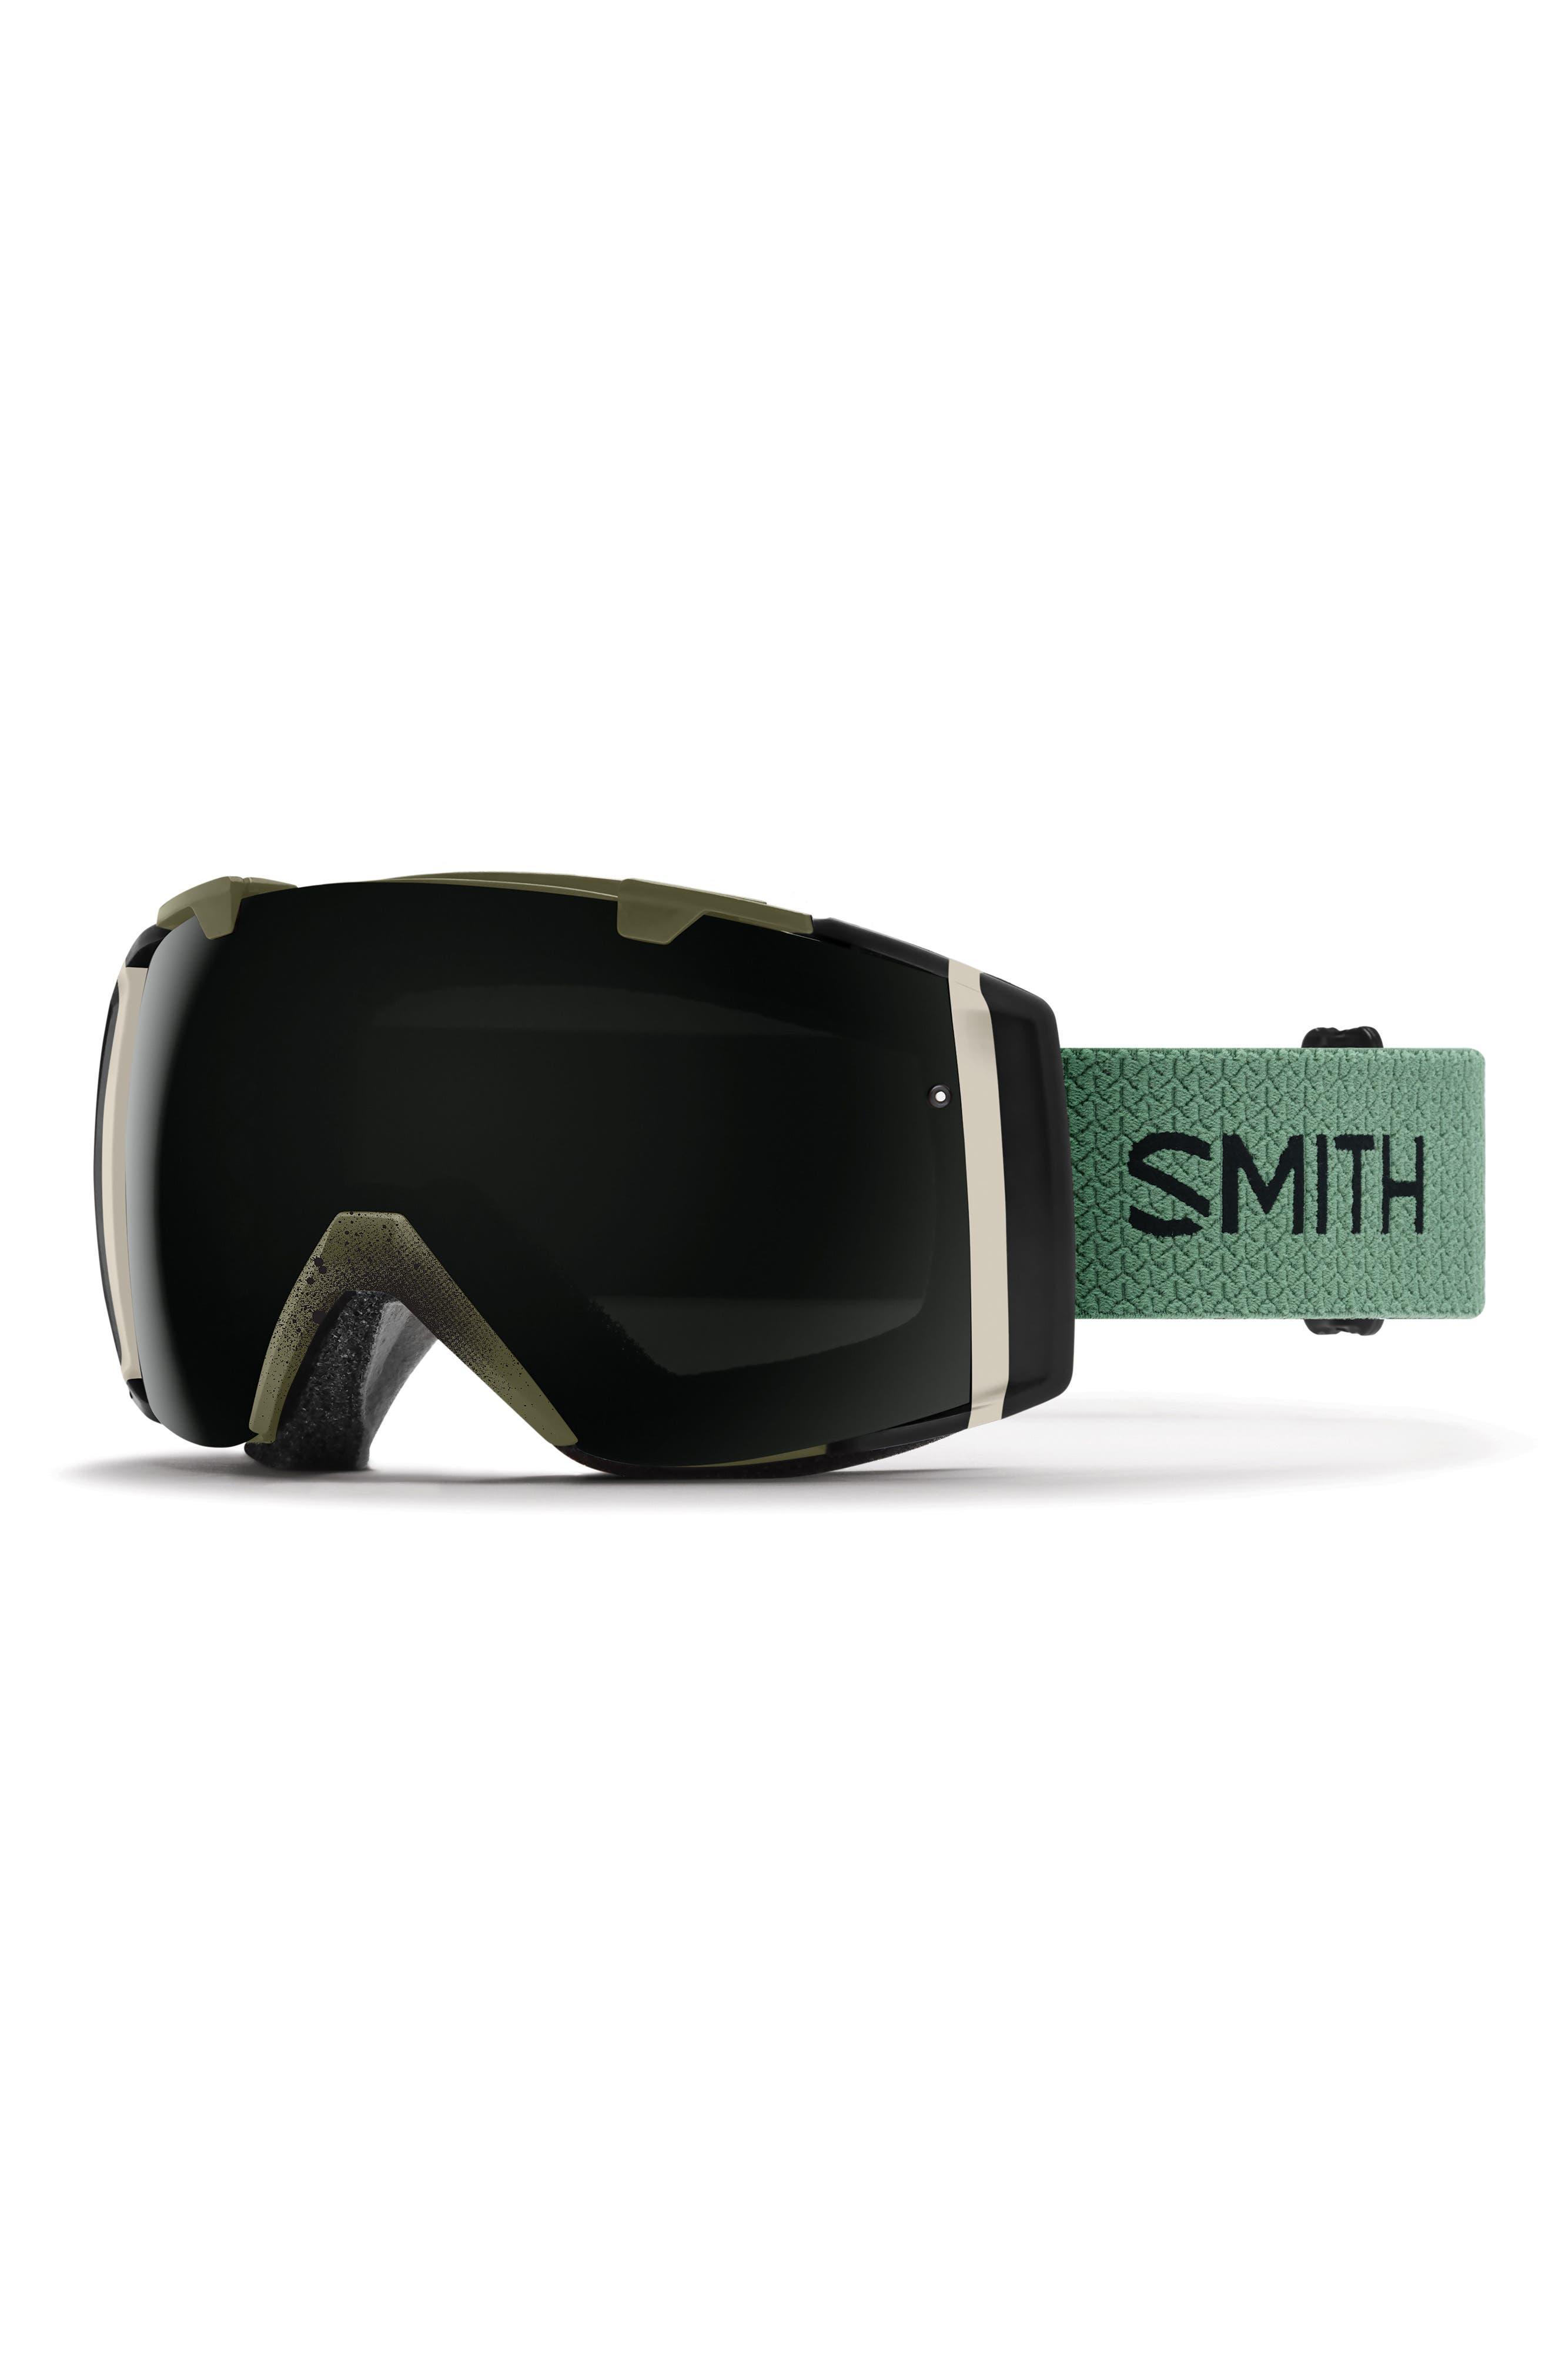 I/OX 205mm Chromapop Snow Goggles,                         Main,                         color, Olive